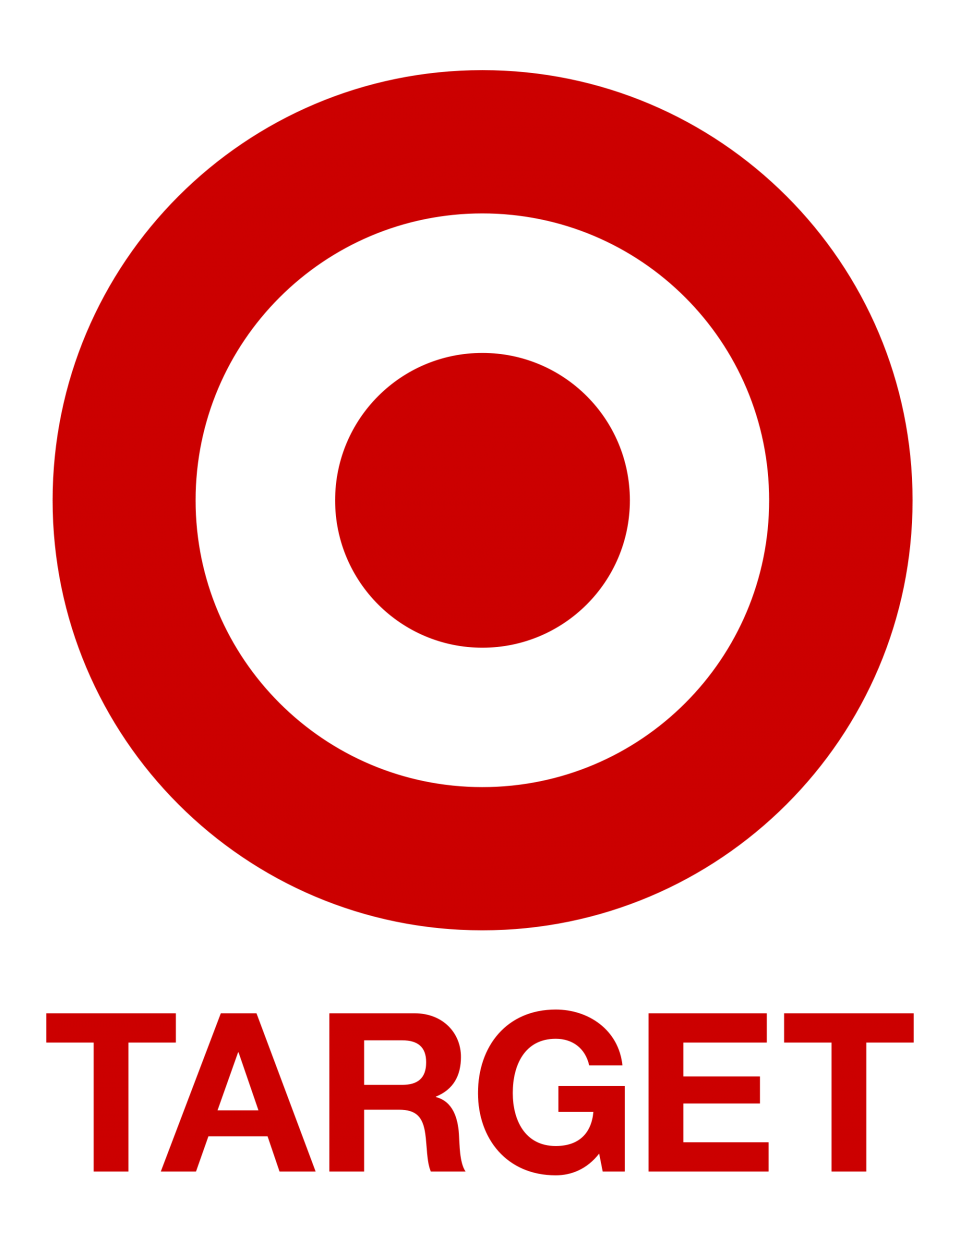 Target Logo Png Image Purepng Free Transparent Cc0 Png Image Library